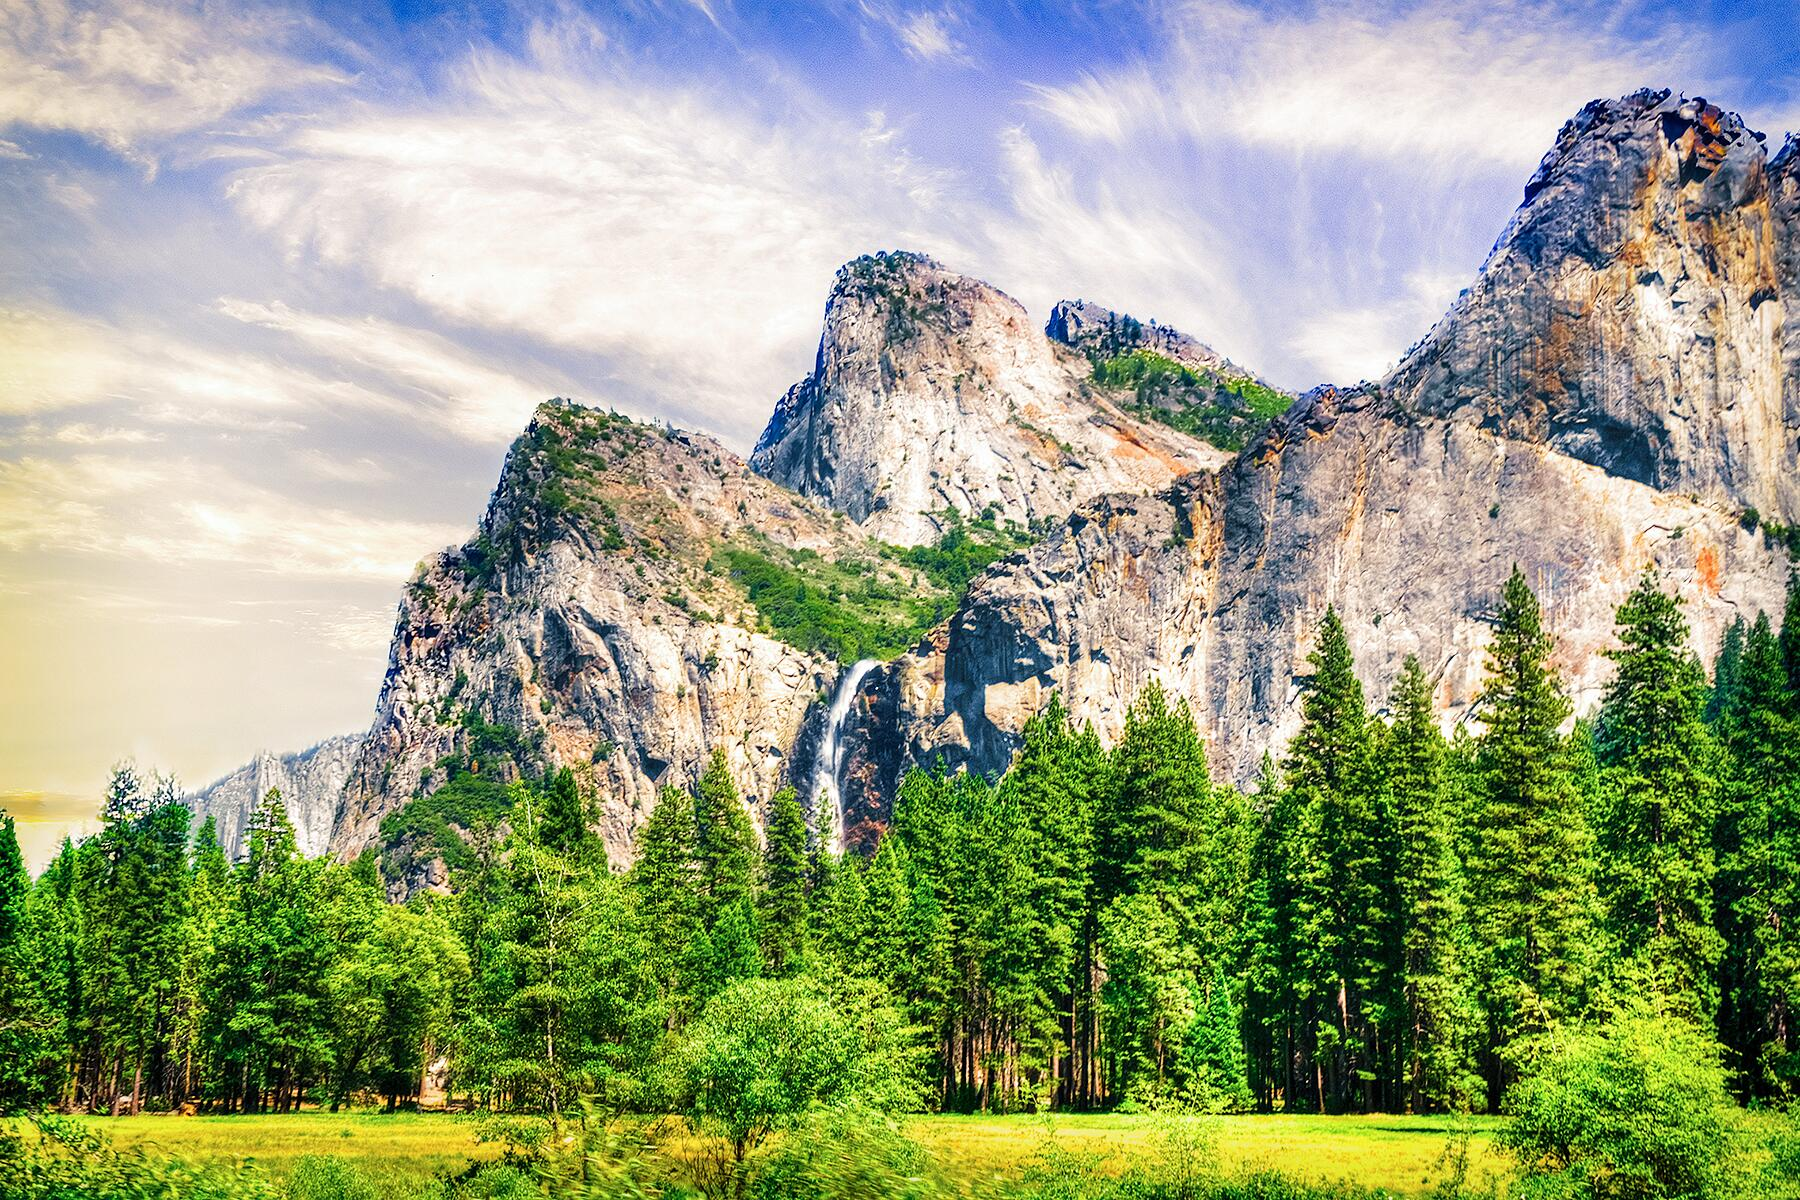 Kings Canyon to Yosemite National Park, California